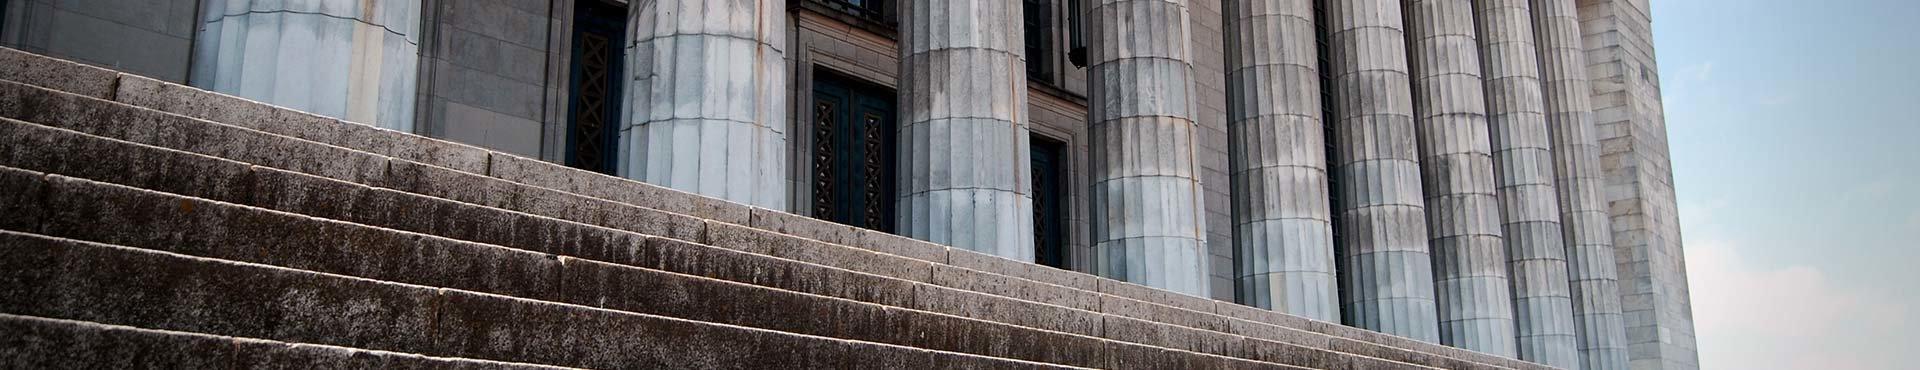 Outside a courtroom | Shine Lawyers